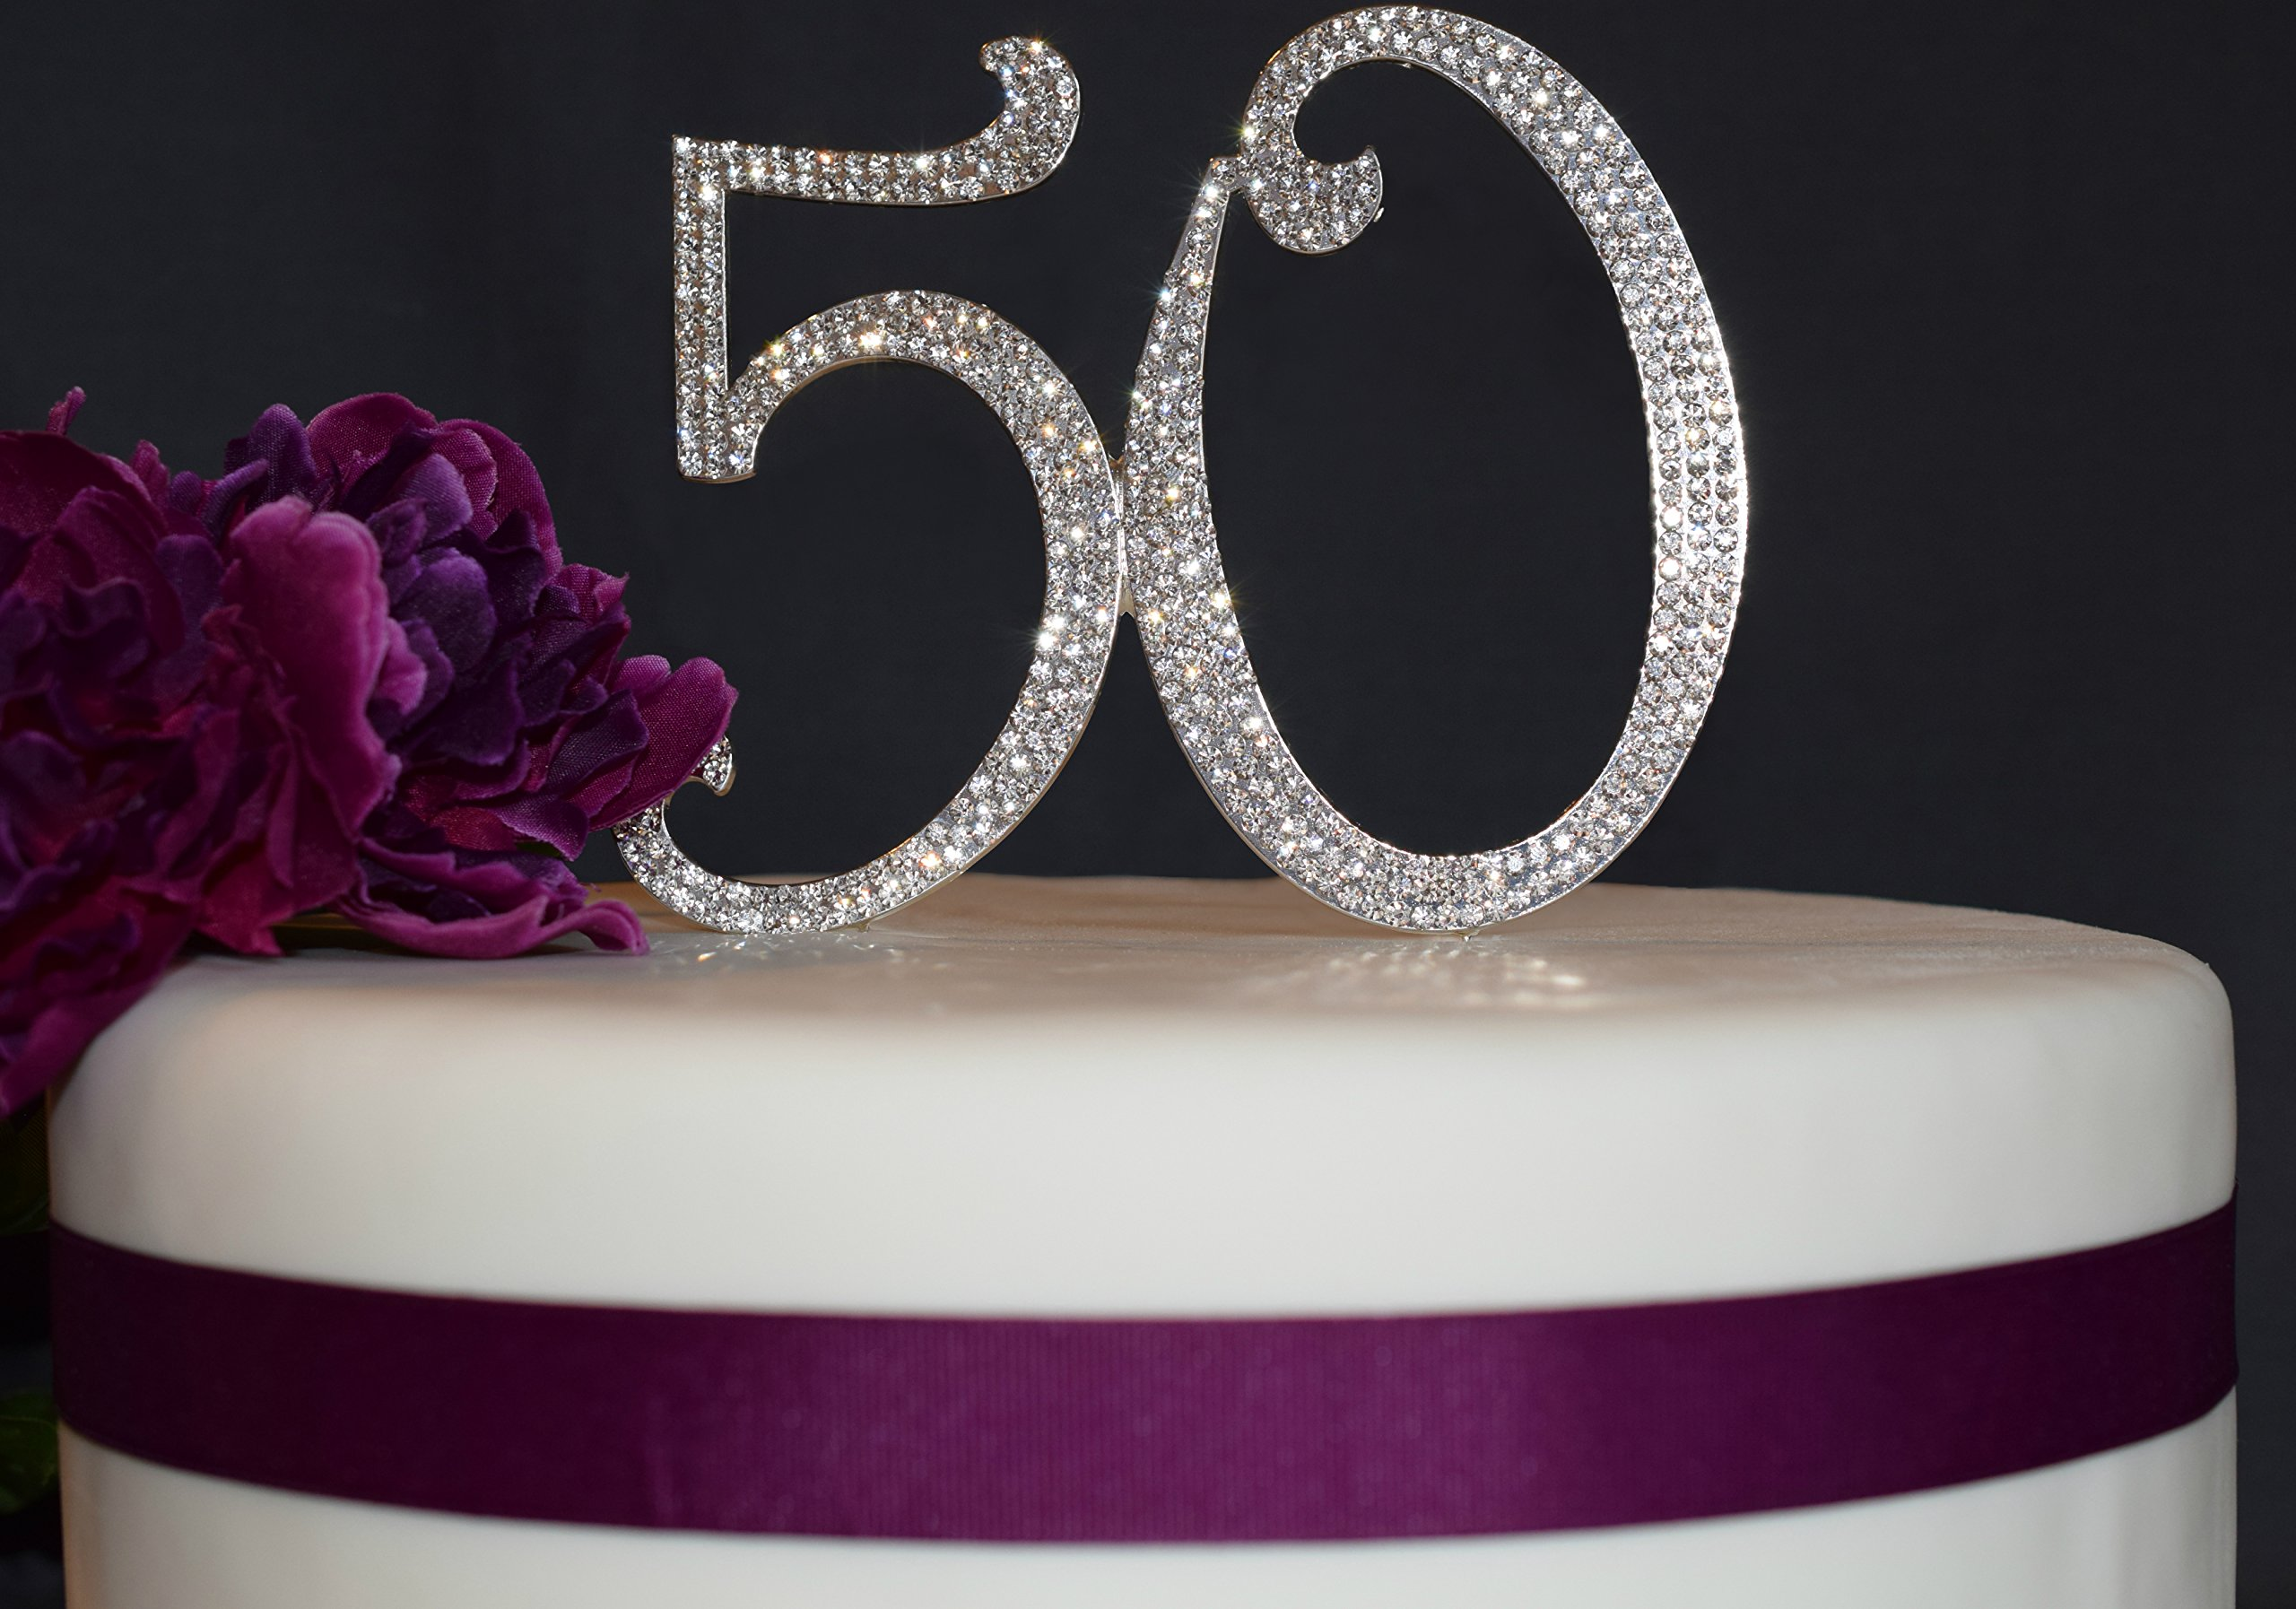 50 Cake Topper | Premium Sparkly Crystal Rhinestones | 50th Birthday or Anniversary Party Decoration Ideas | Perfect Keepsake (50 Silver)